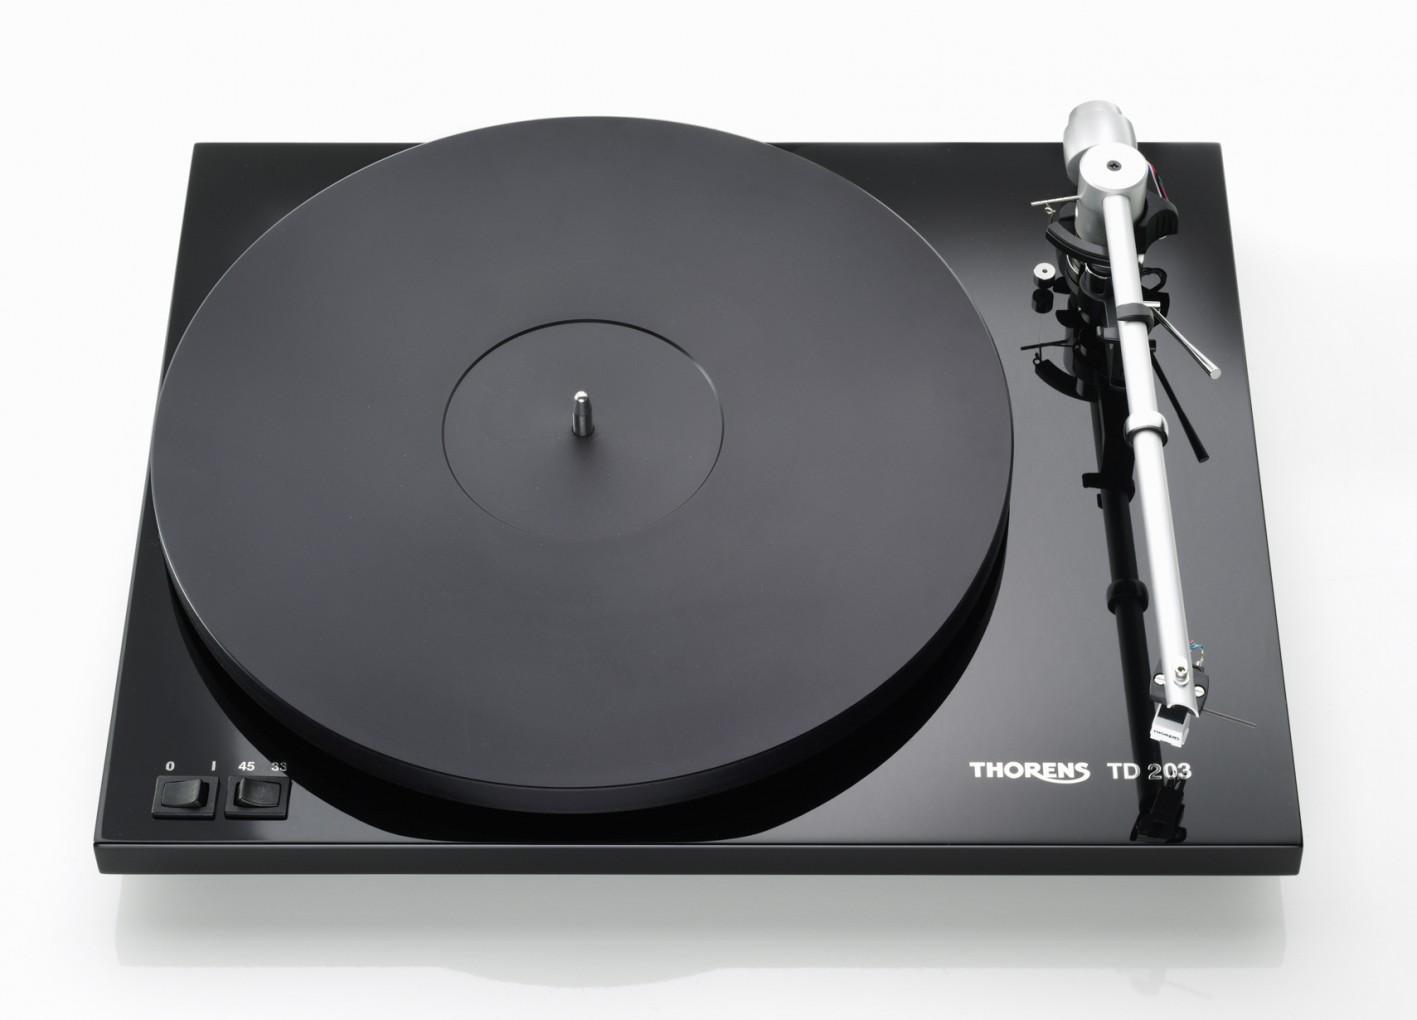 Thorens-TD-203-bl.-1